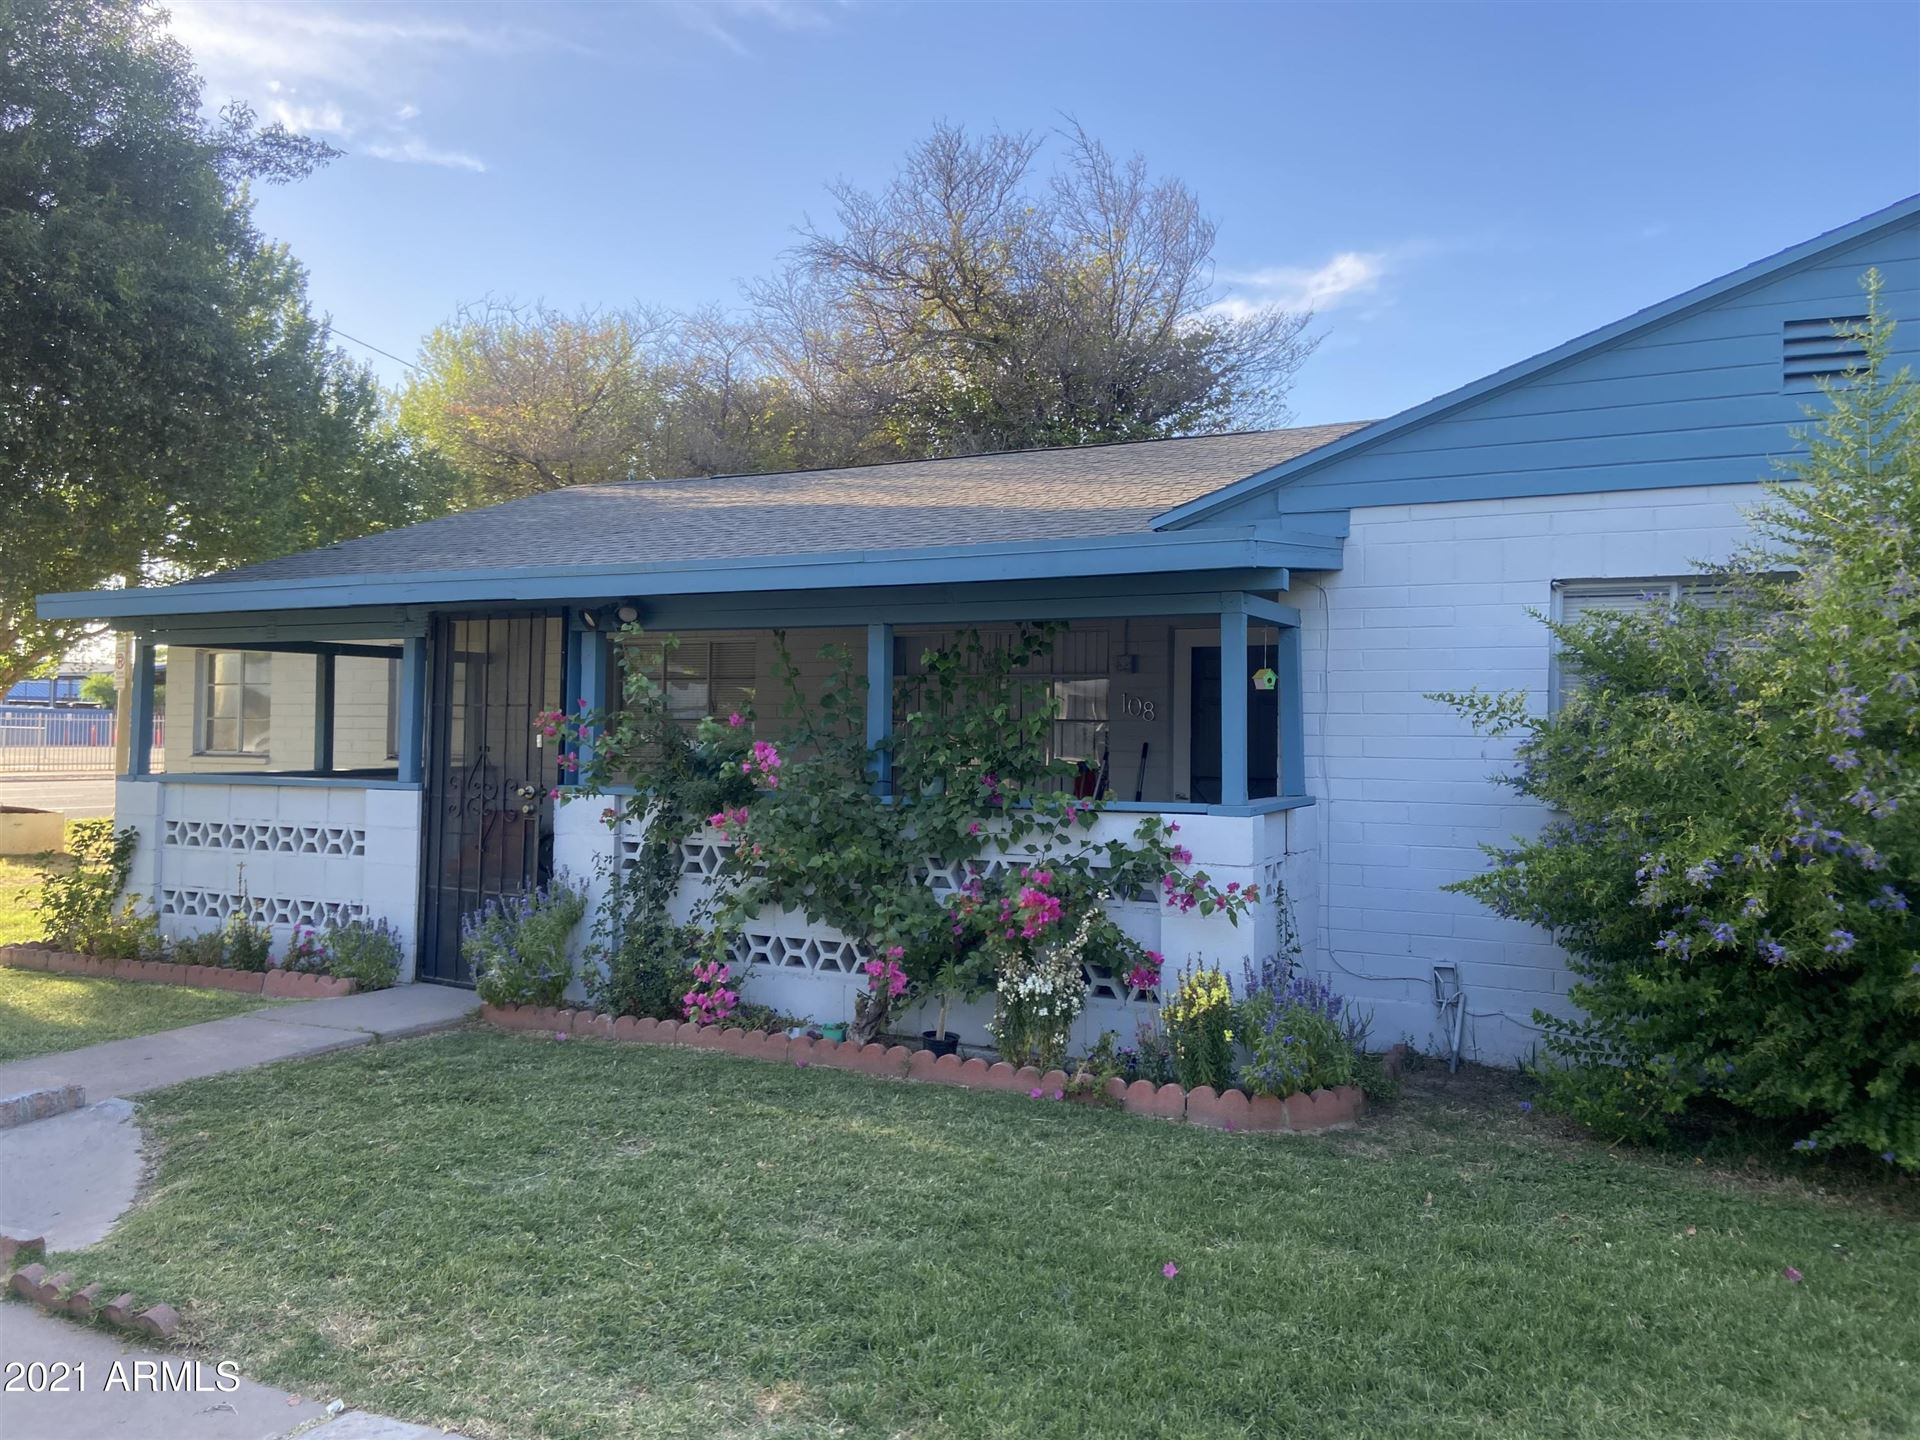 2925 N 19TH Avenue #108, Phoenix, AZ 85015 - MLS#: 6248252